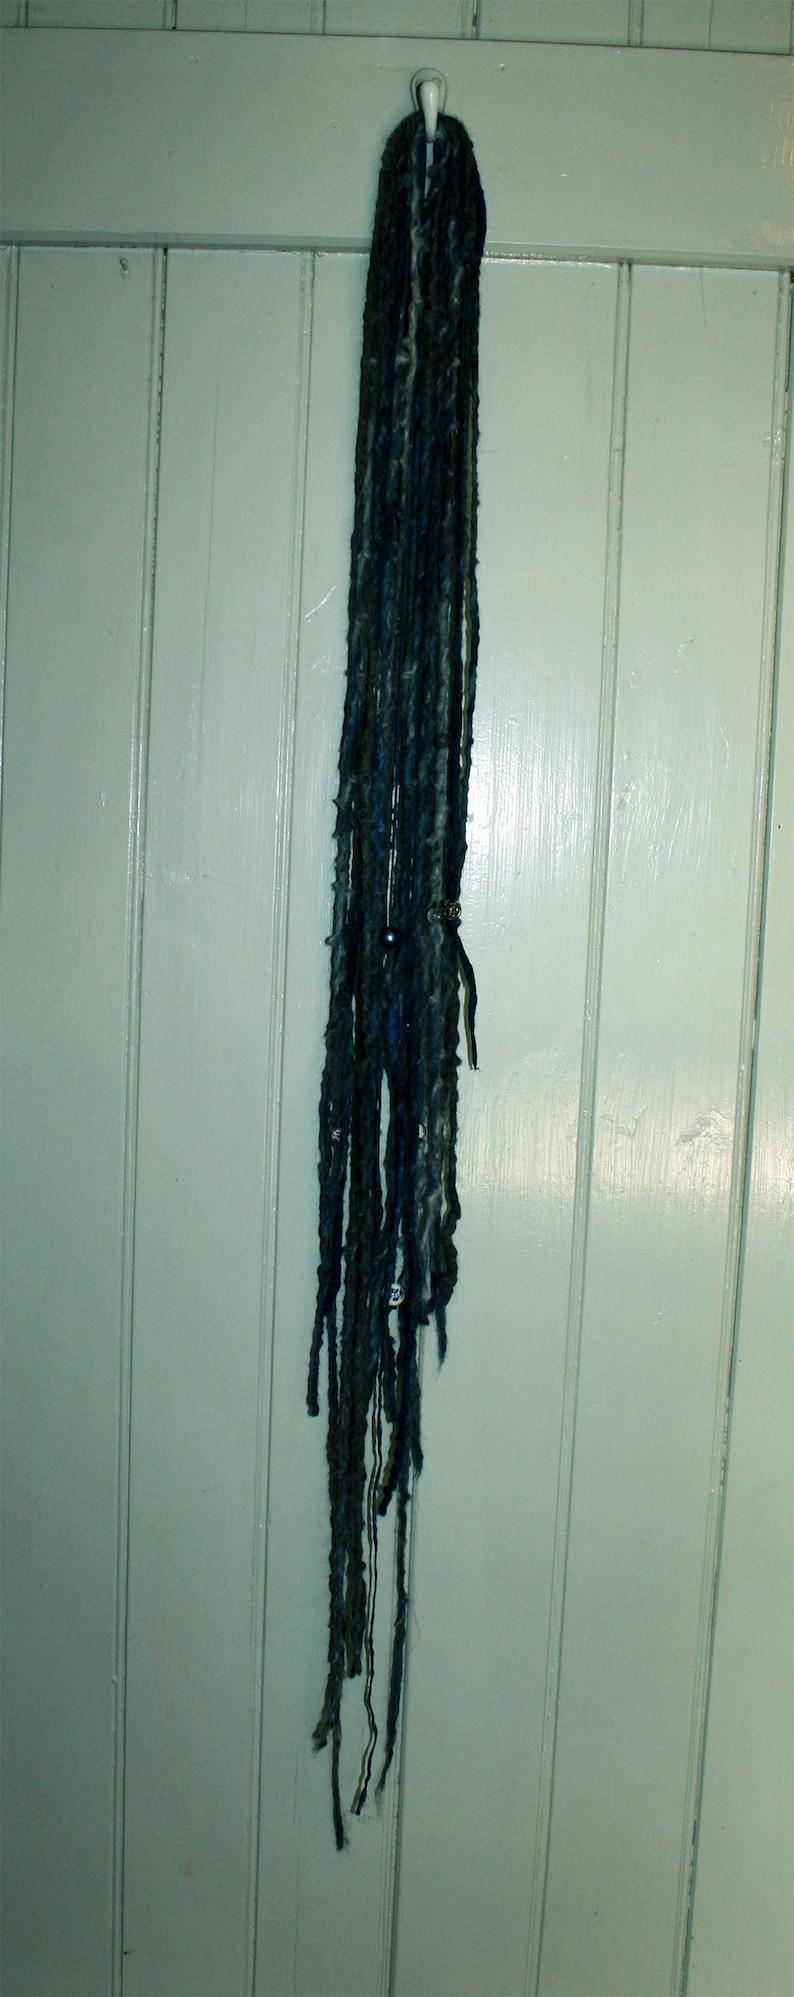 Dreadlocks with beads of hand-spun single yarn matted Blue Magic